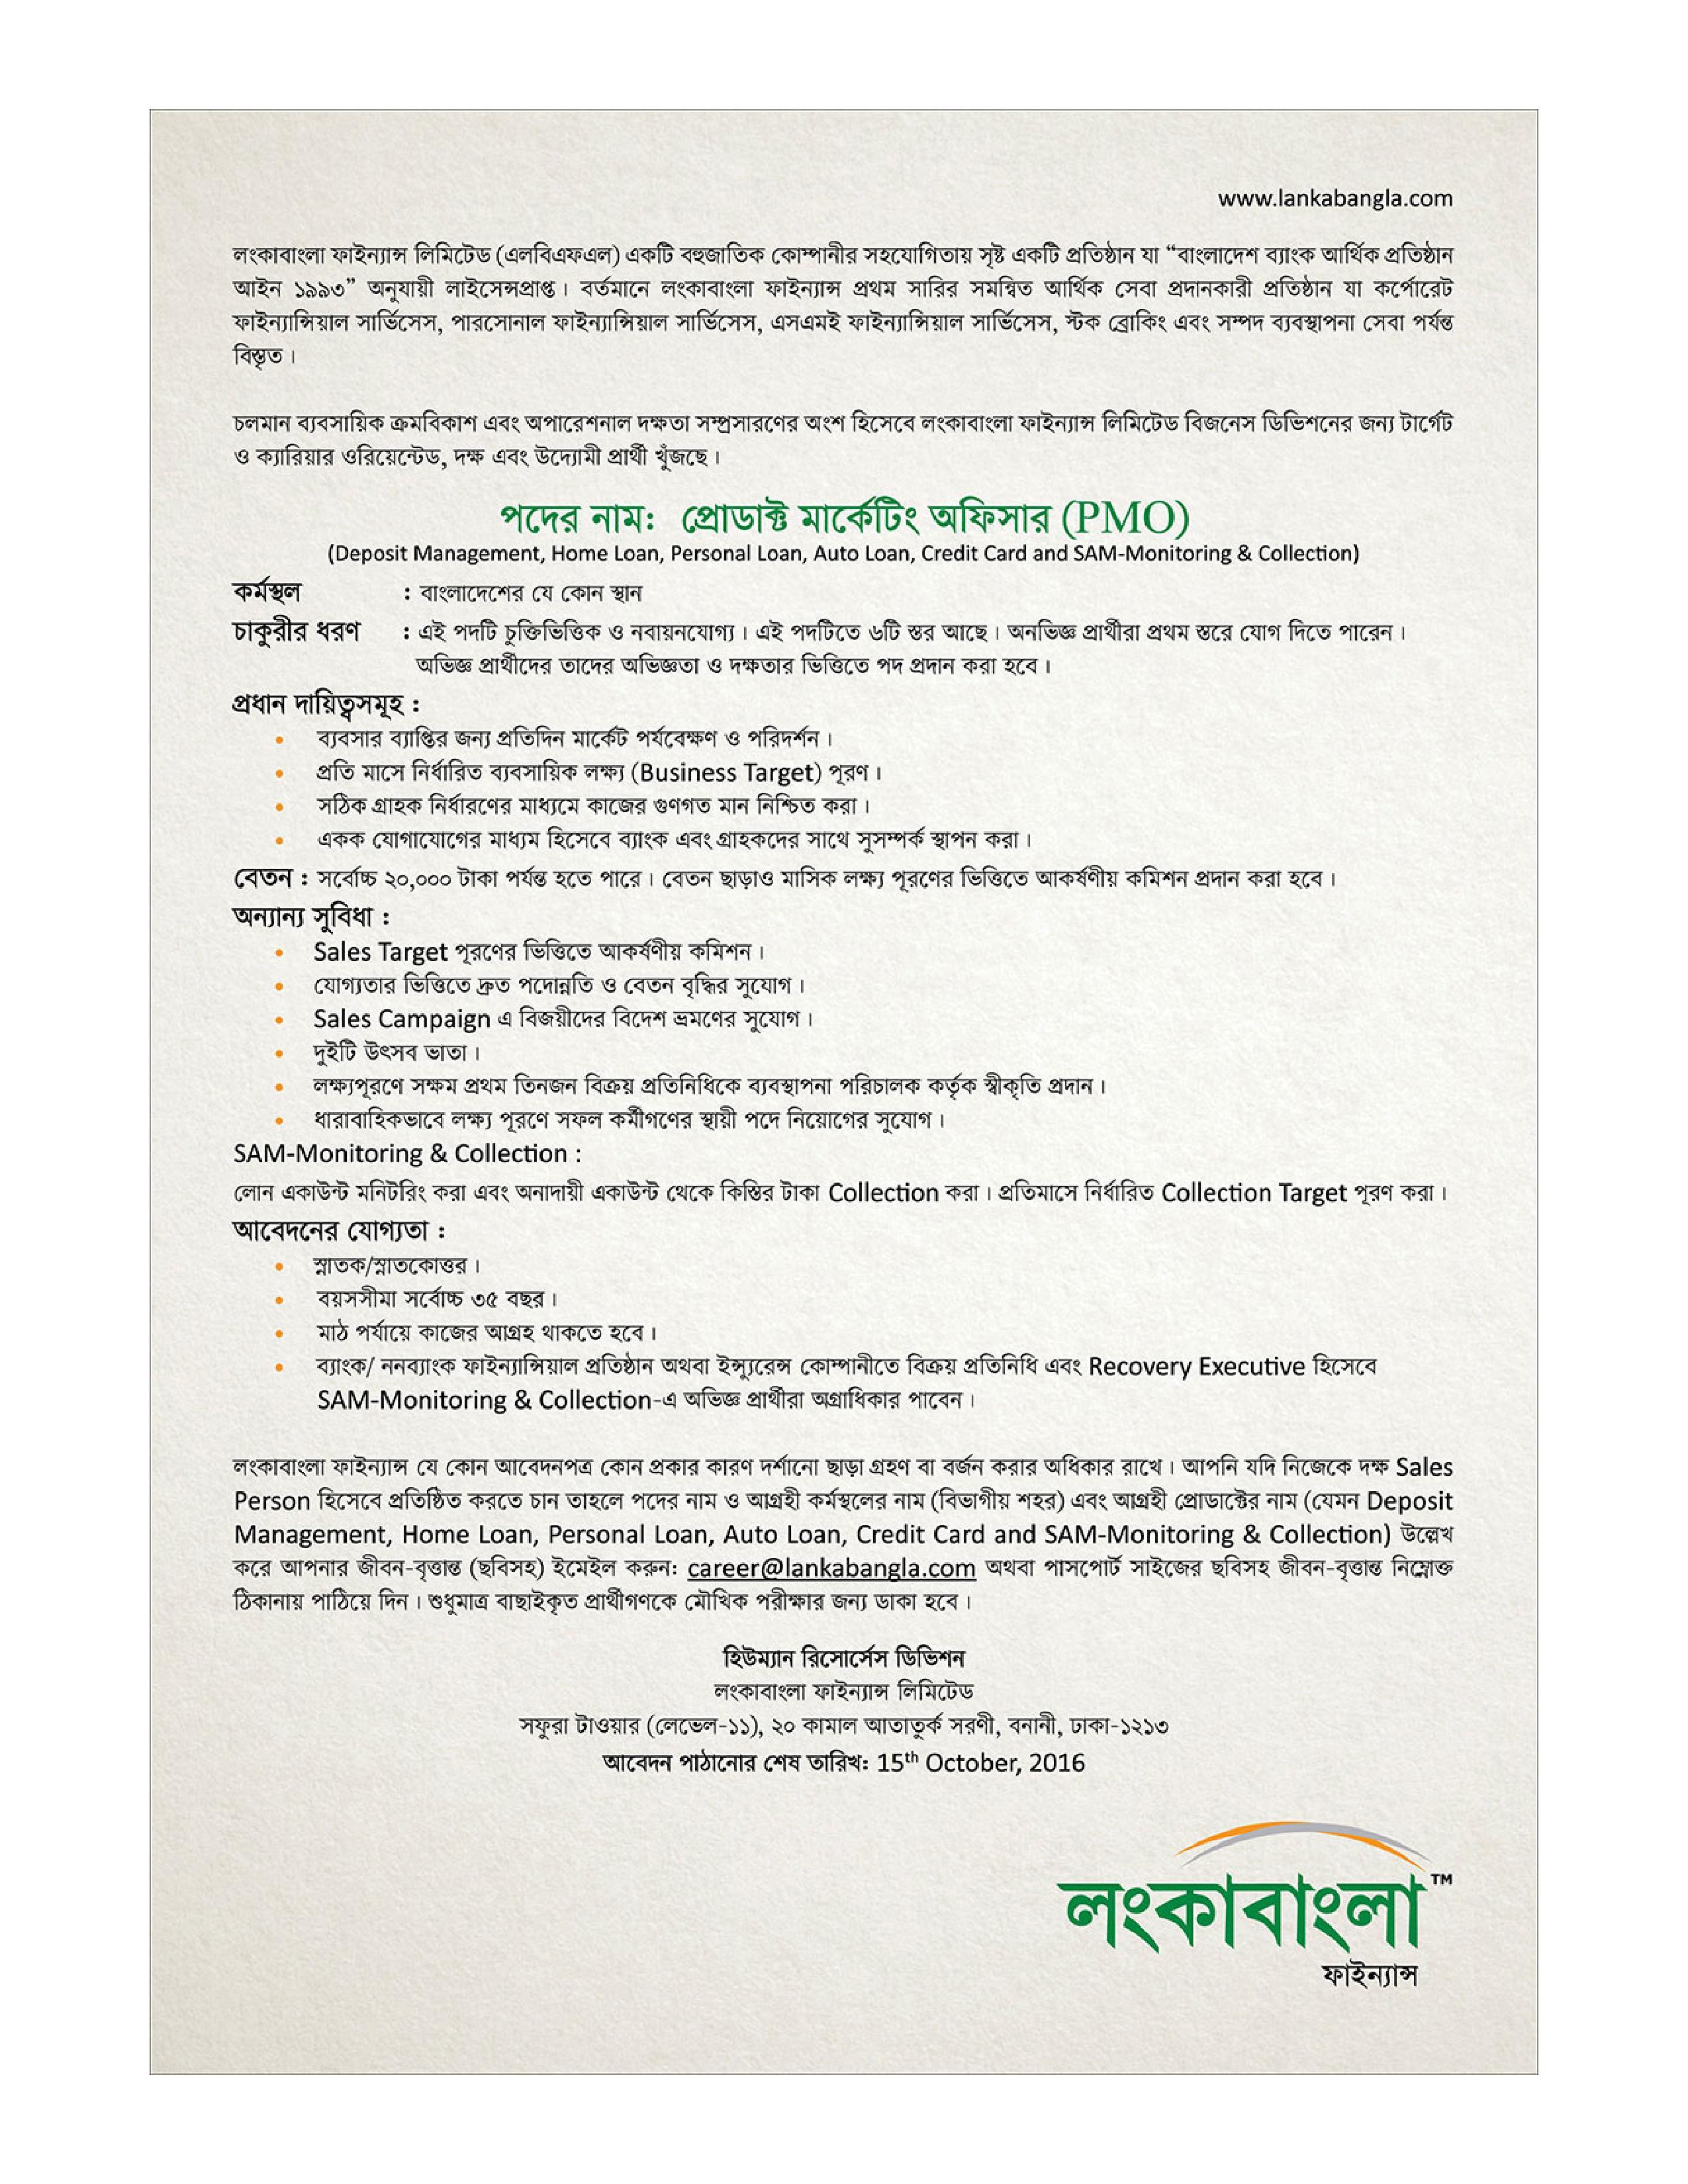 LankaBangla Finance Job Circular 2016